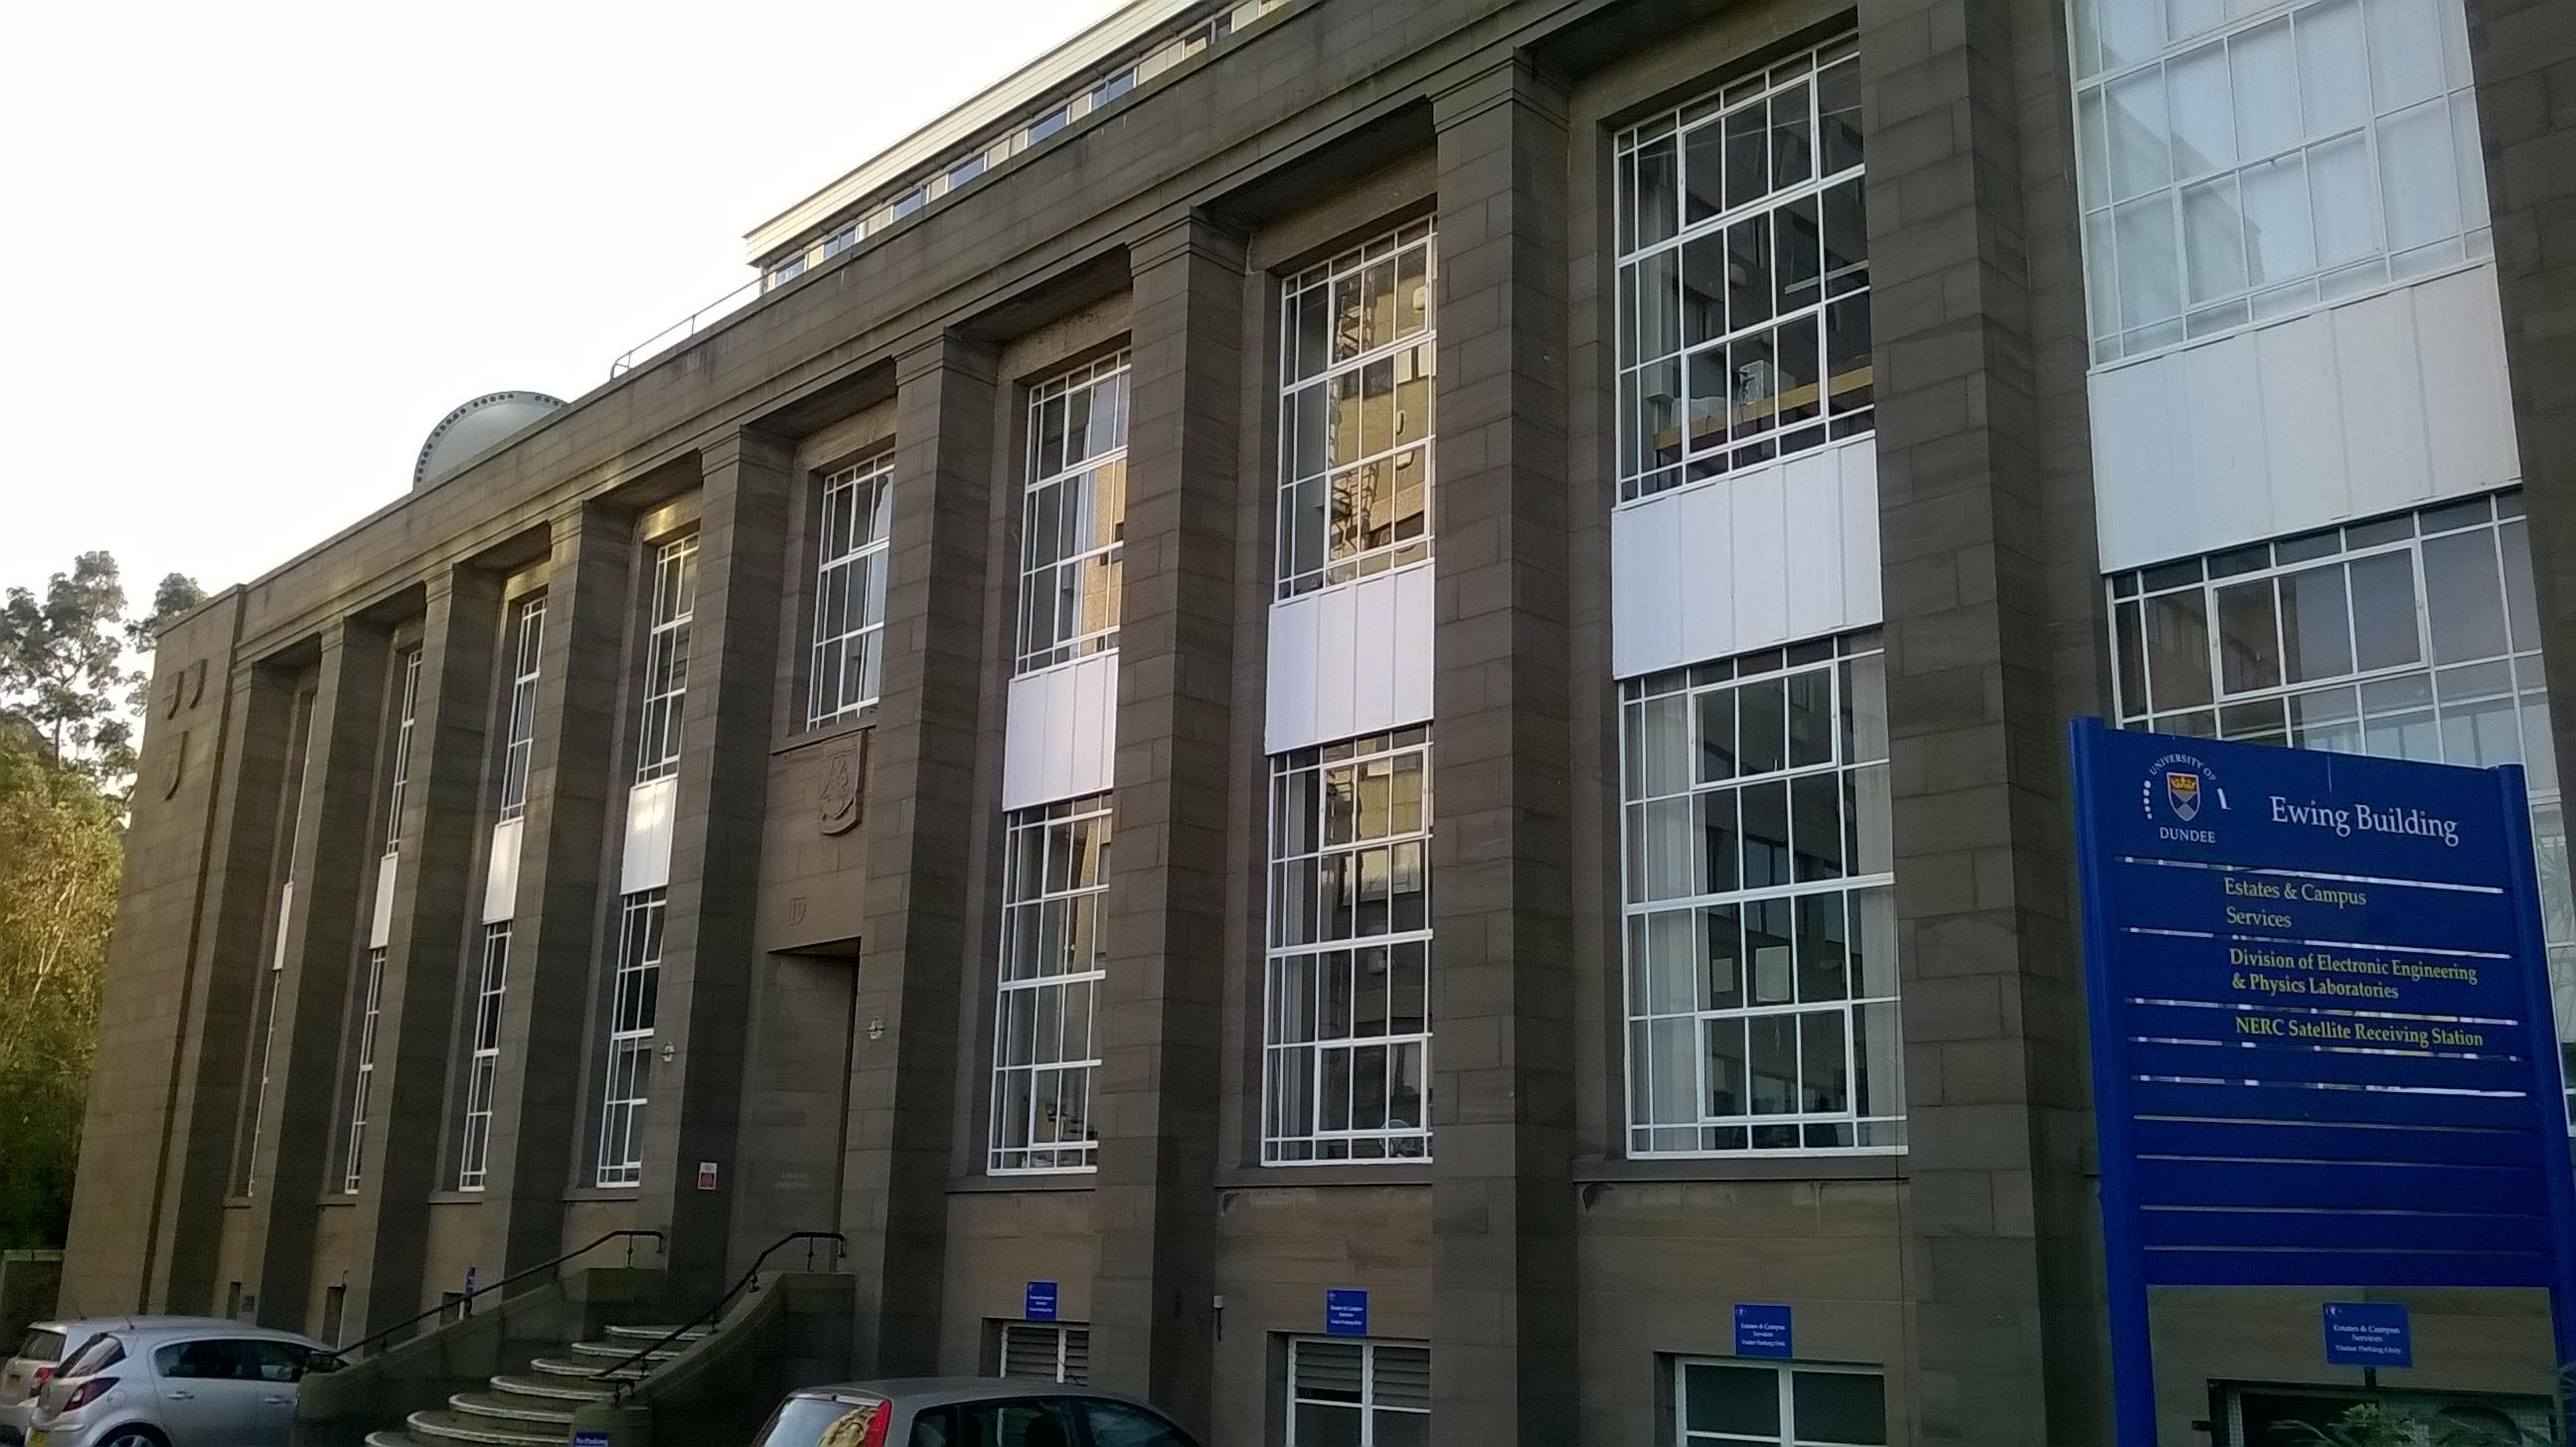 Dundee University Fulton Building